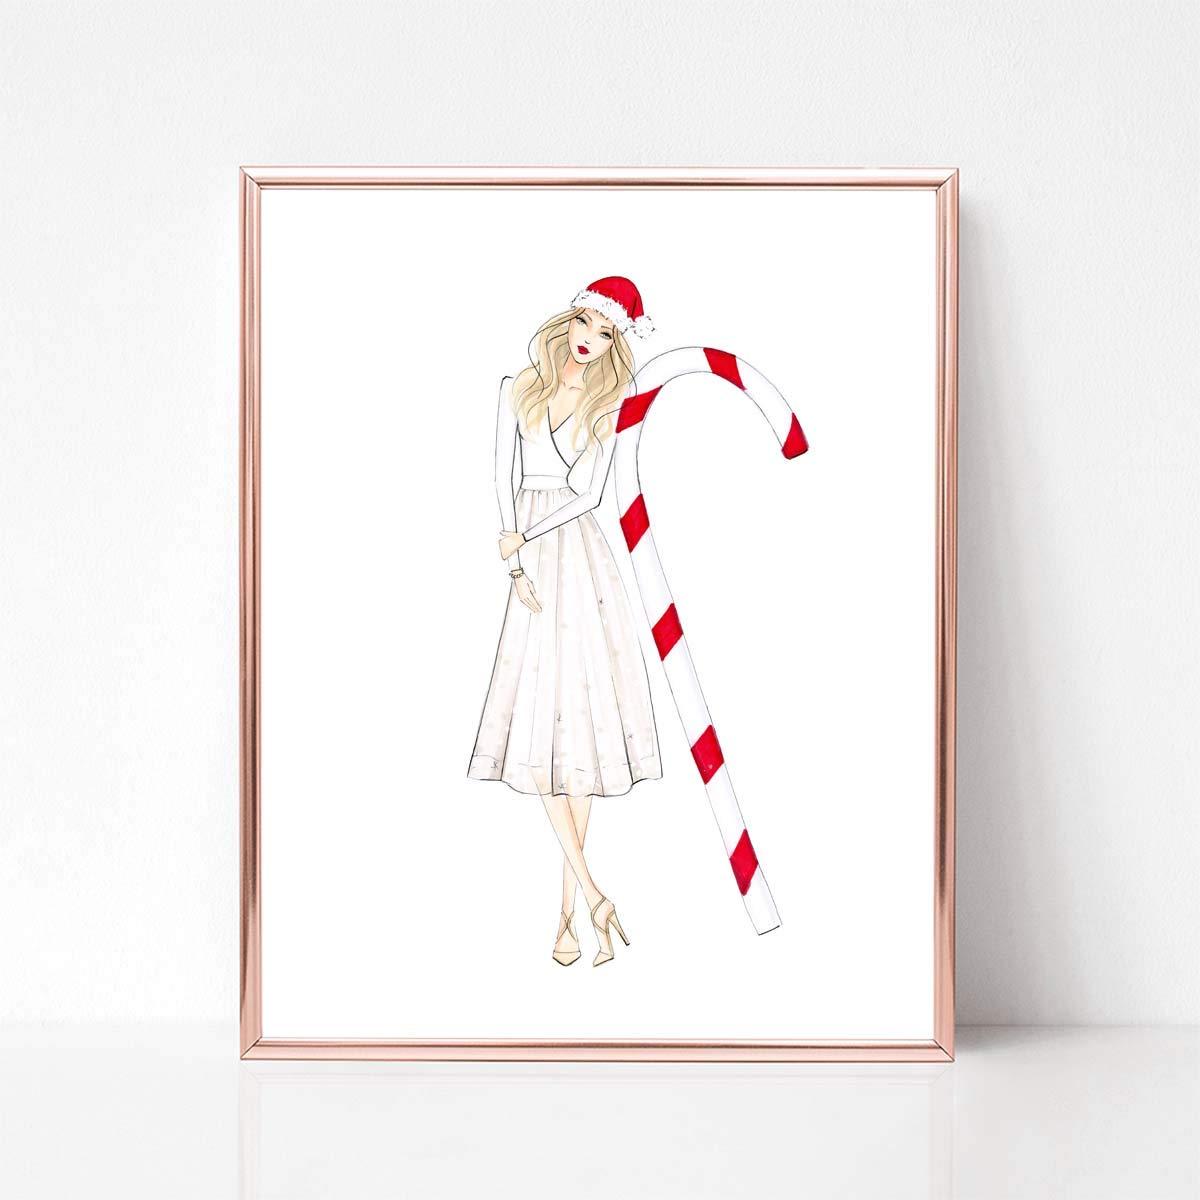 Unframed Candy Cane Girl Fashion Illustration Art Print